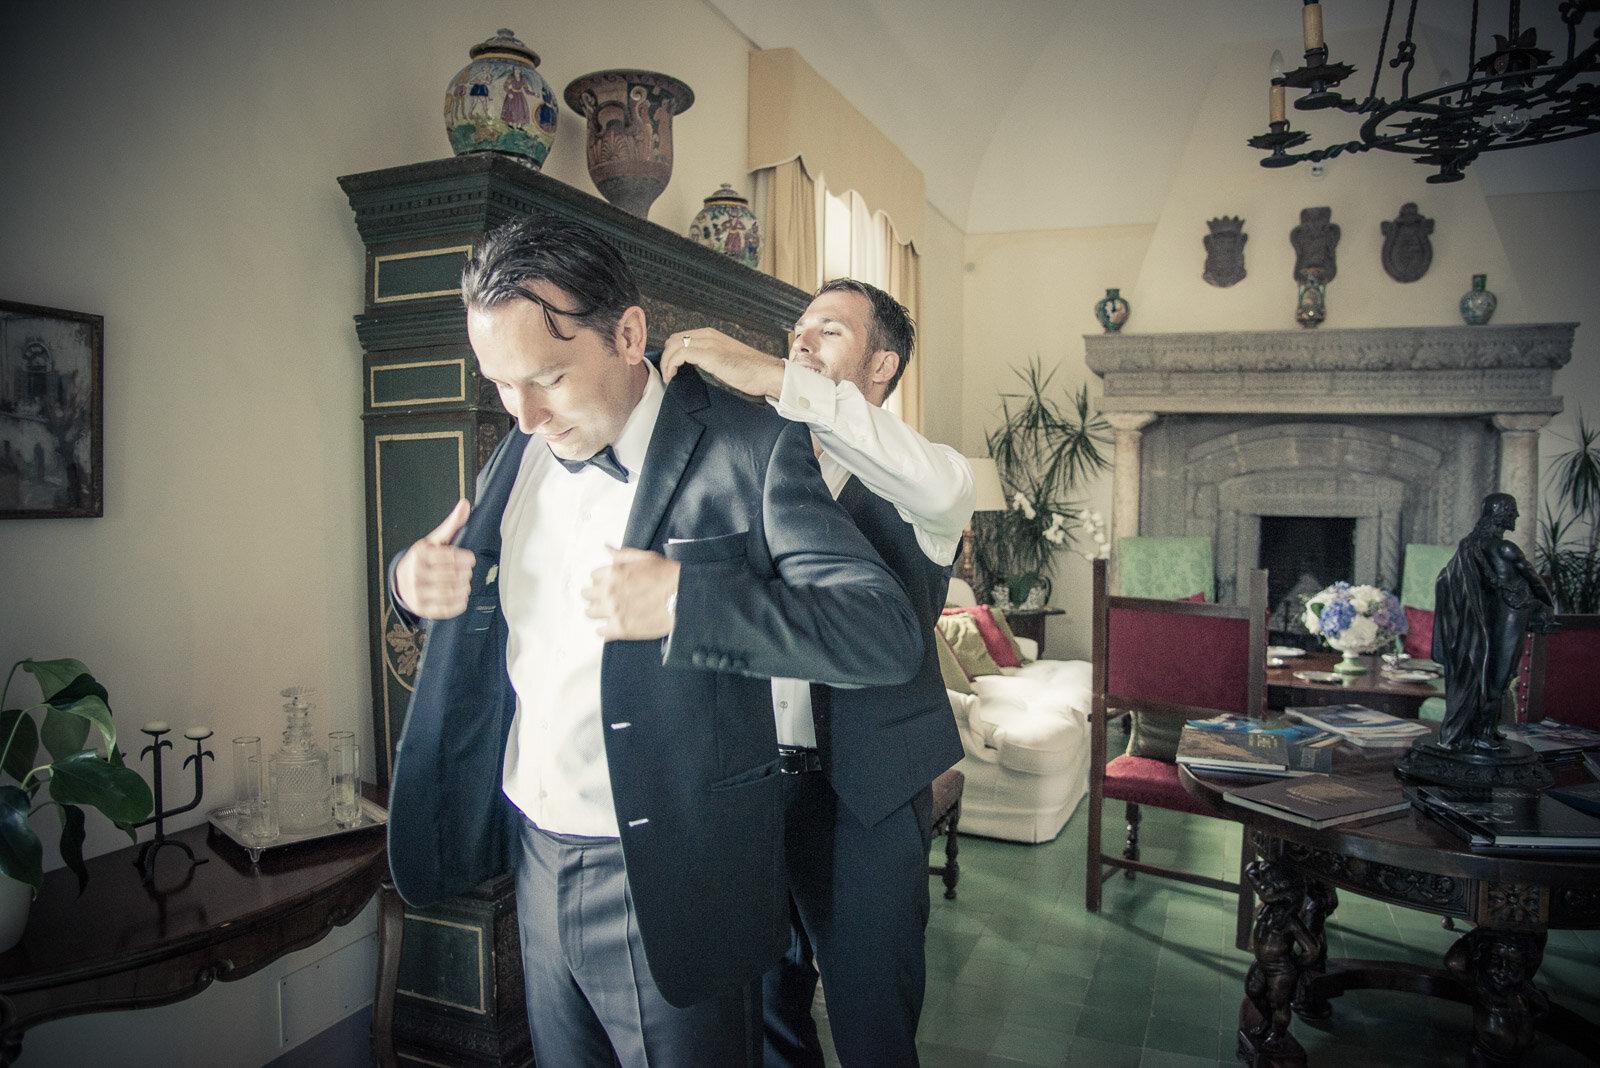 Russian Wedding in Villa Cimbrone Costiera Amalfitana 04.jpg